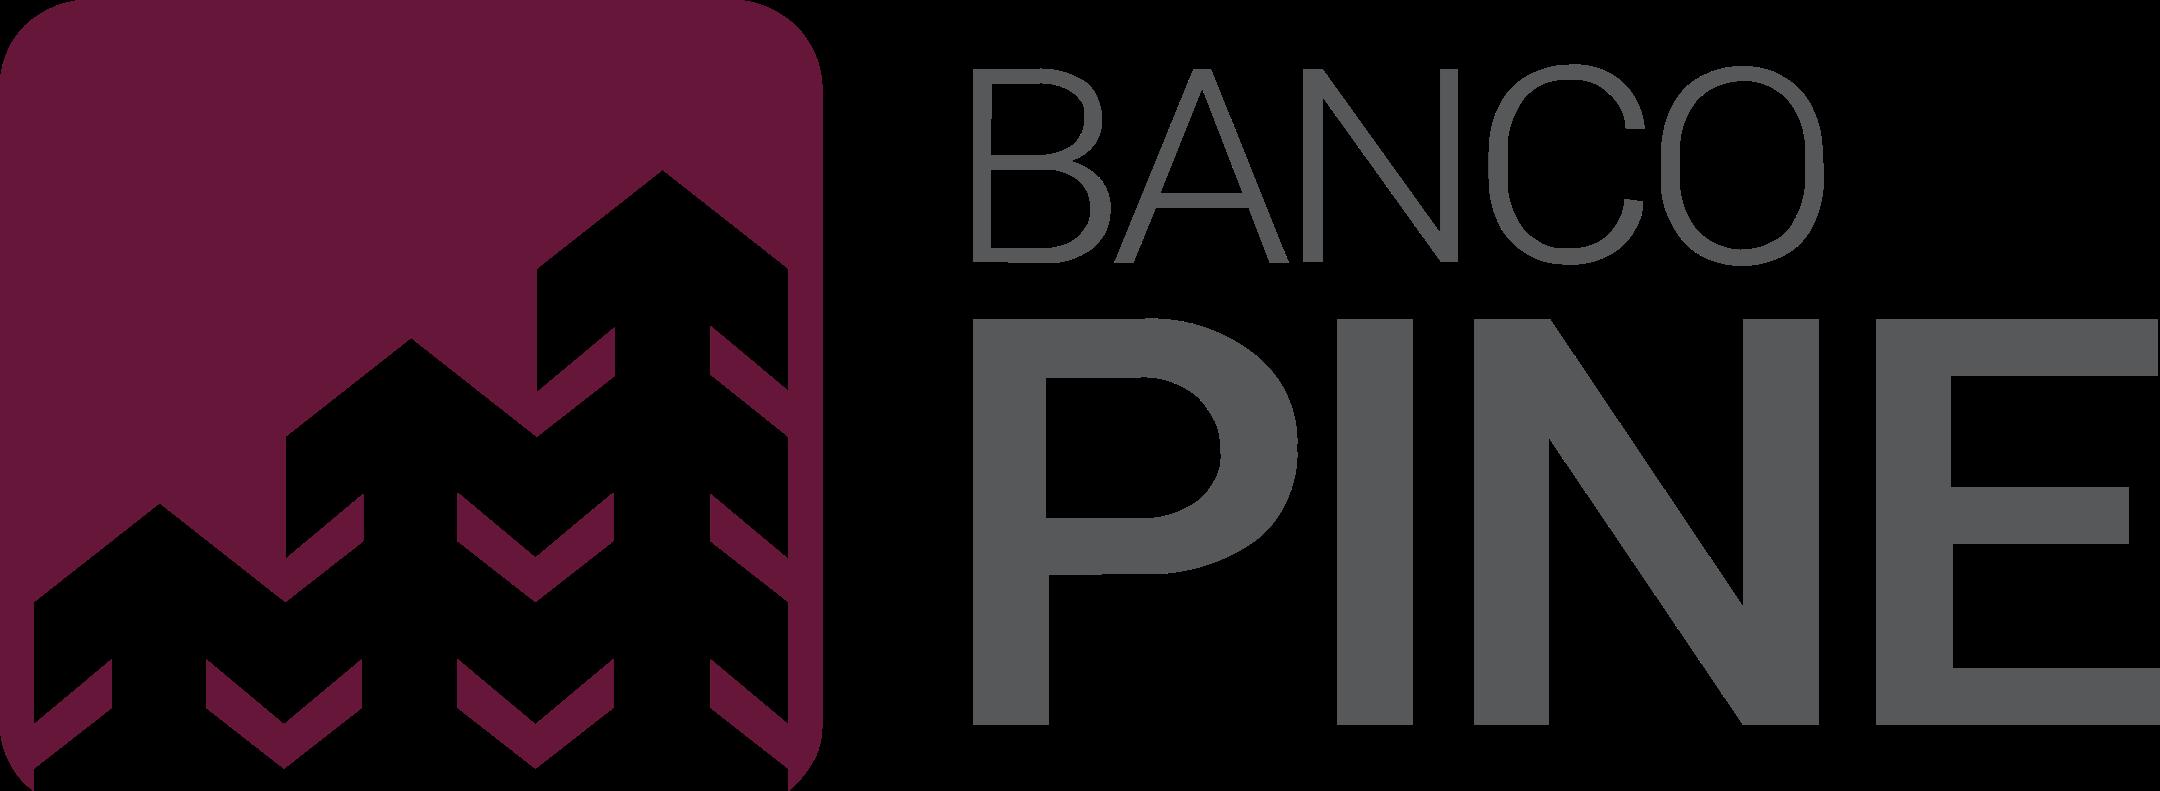 banco pine logo 1 - Banco Pine Logo